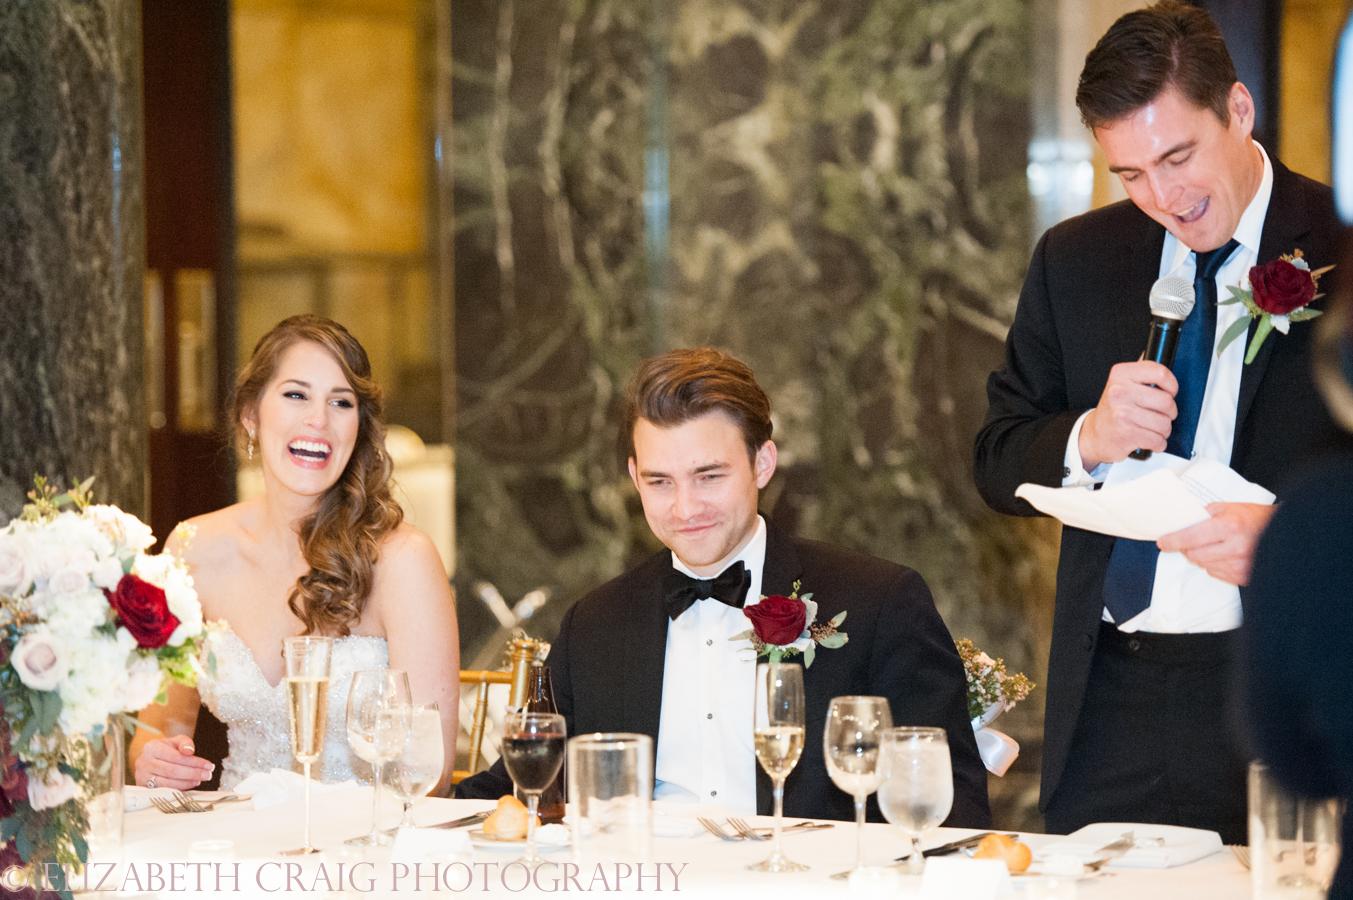 Carnegie Museum of Art Weddings | Elizabeth Craig Photography-0119